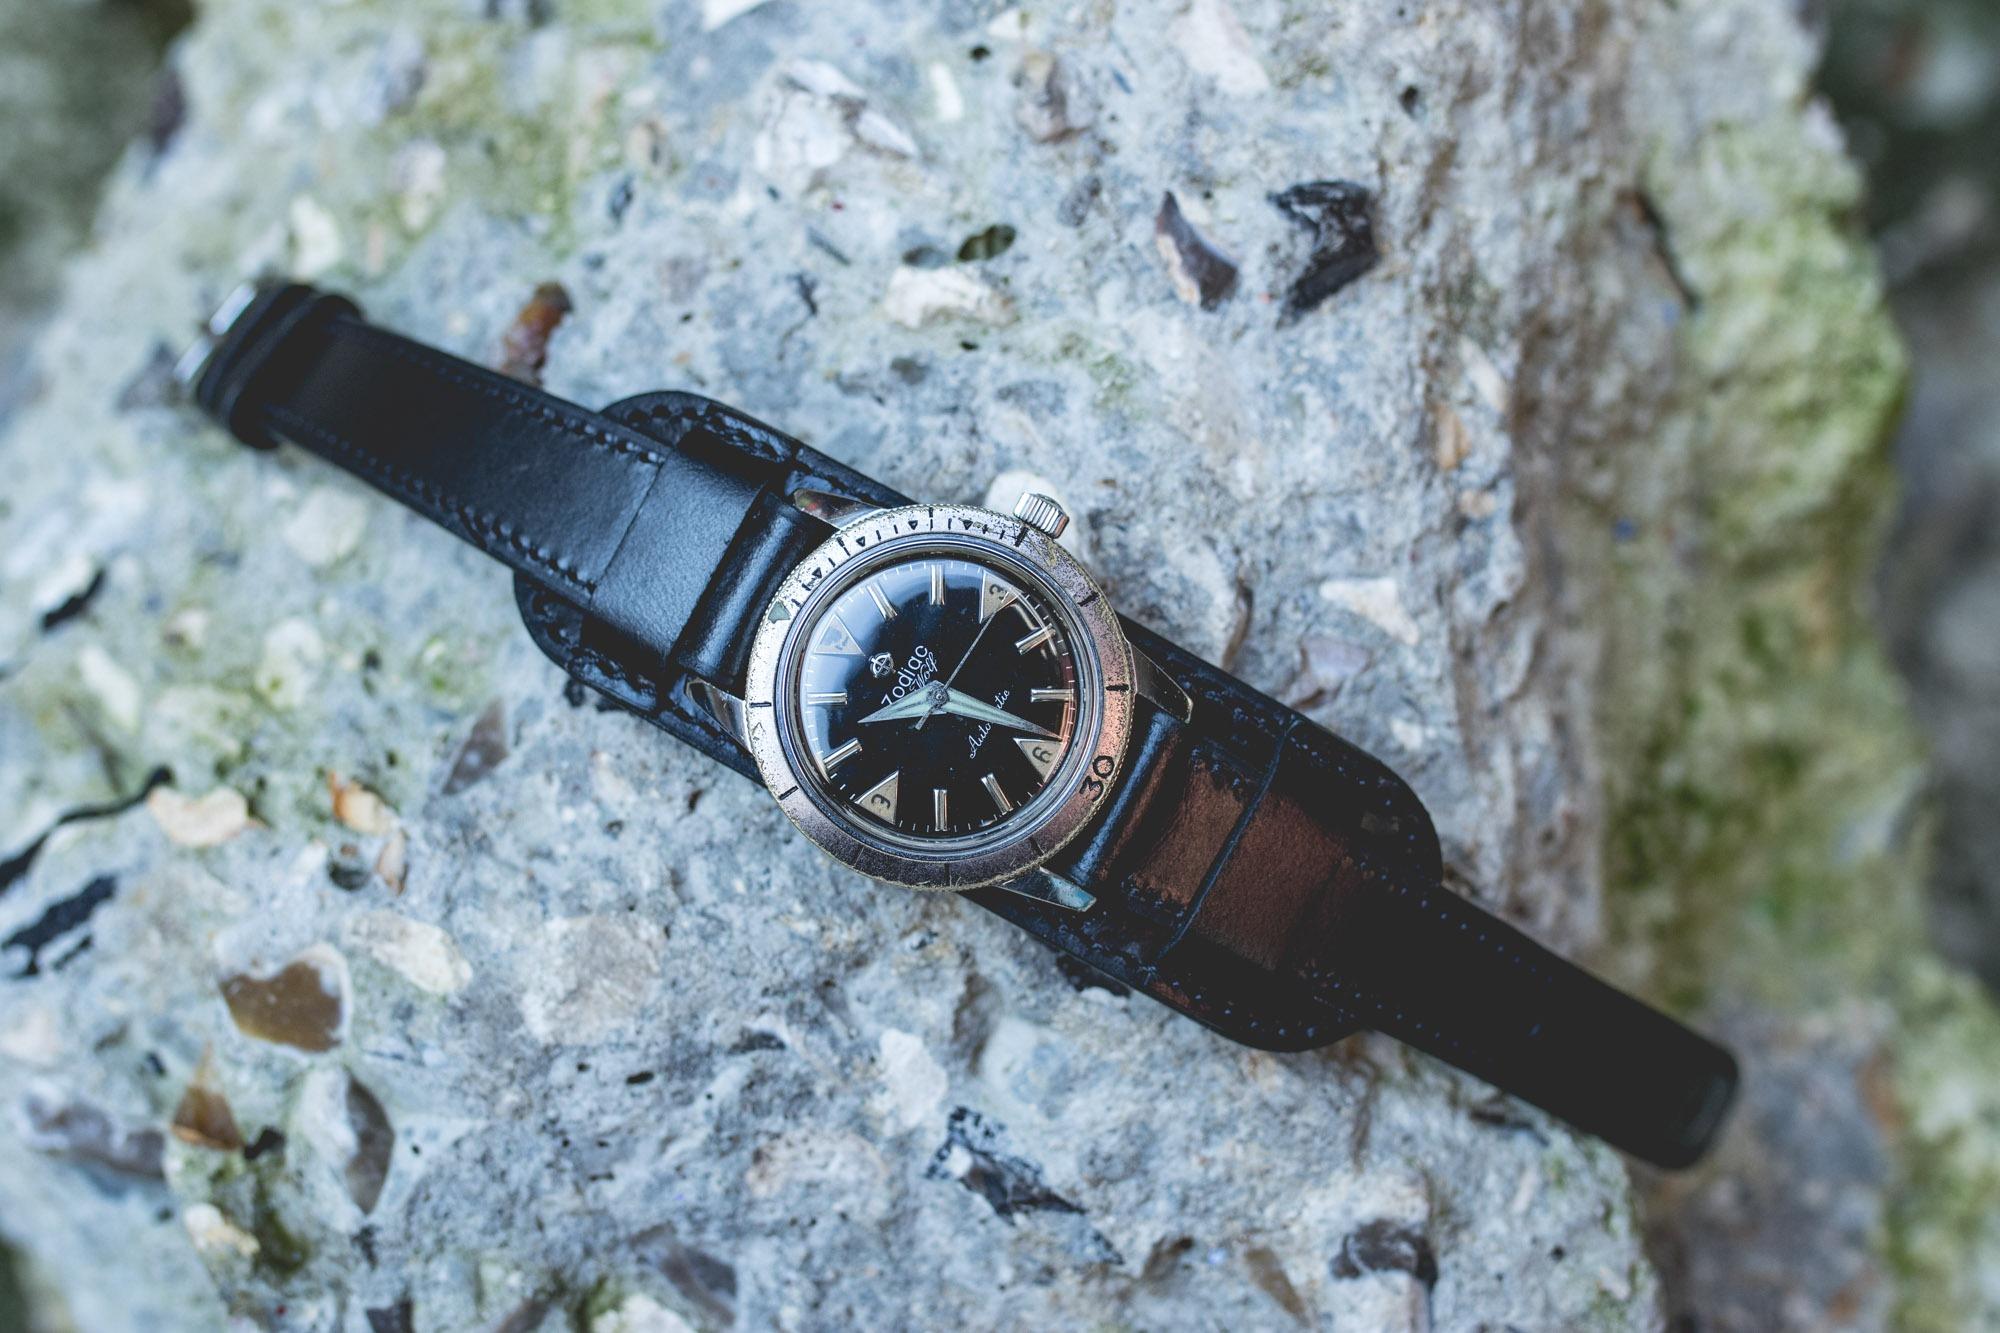 Joseph Bonnie - Bracelet de montre type Bund - Zodiac Seawolf